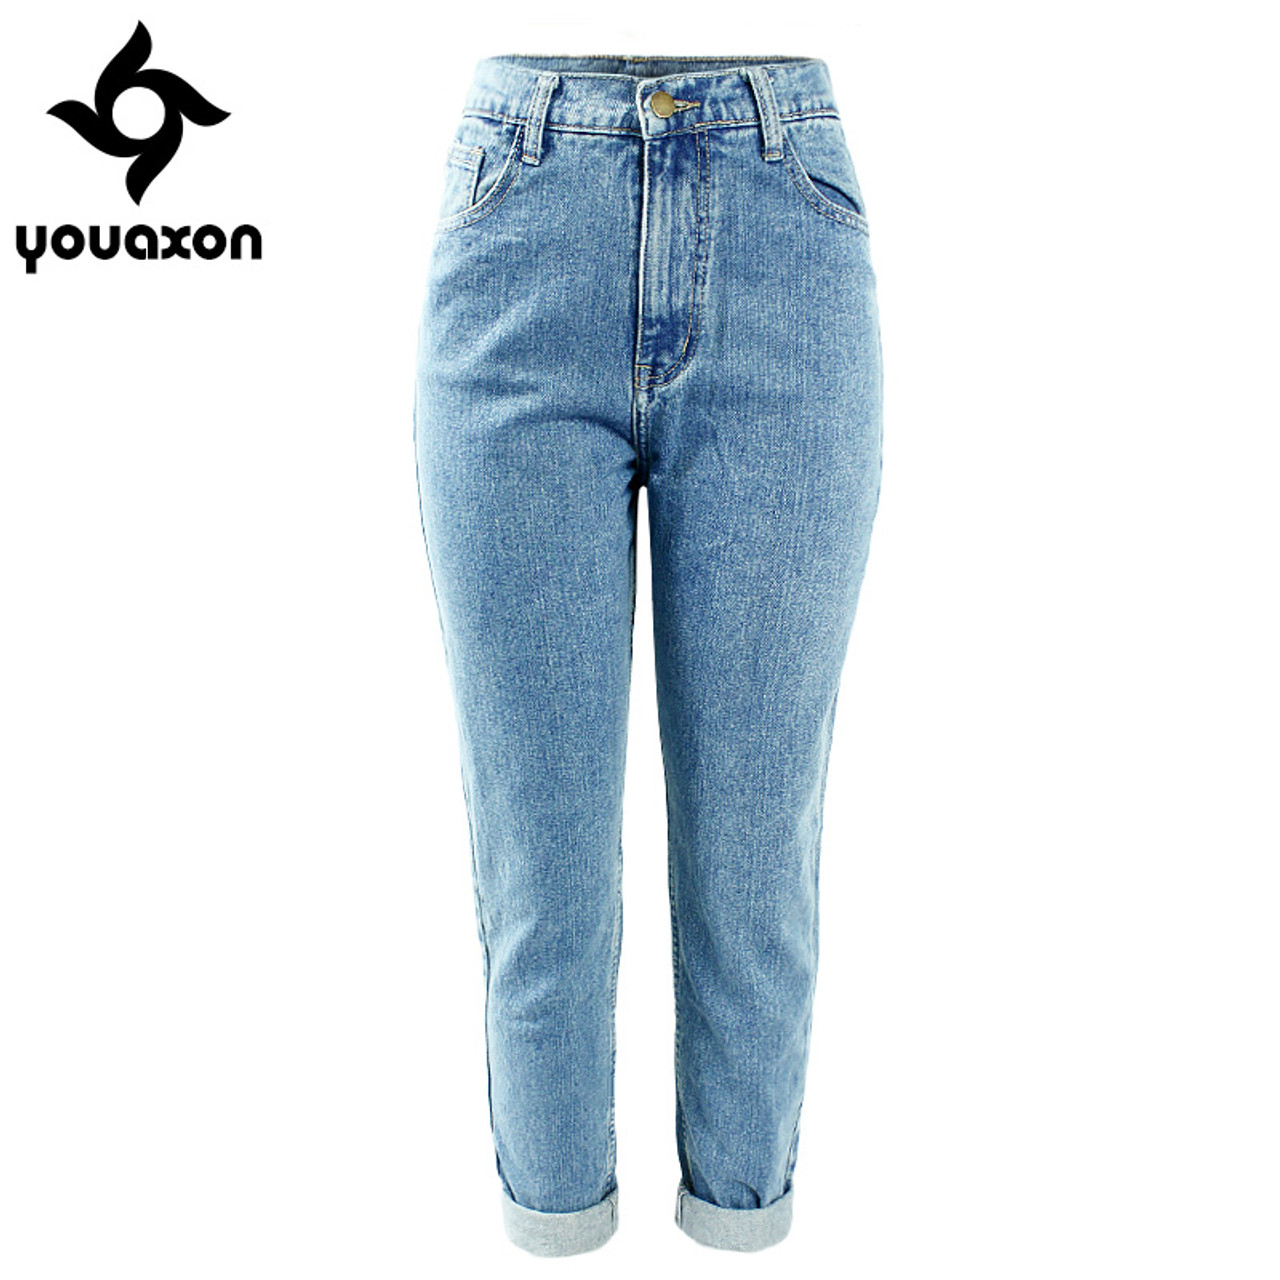 ce743bb7b7 1886 Youaxon Women`s Plus Size High Waist Washed Light Blue True Denim  Pants Boyfriend ...